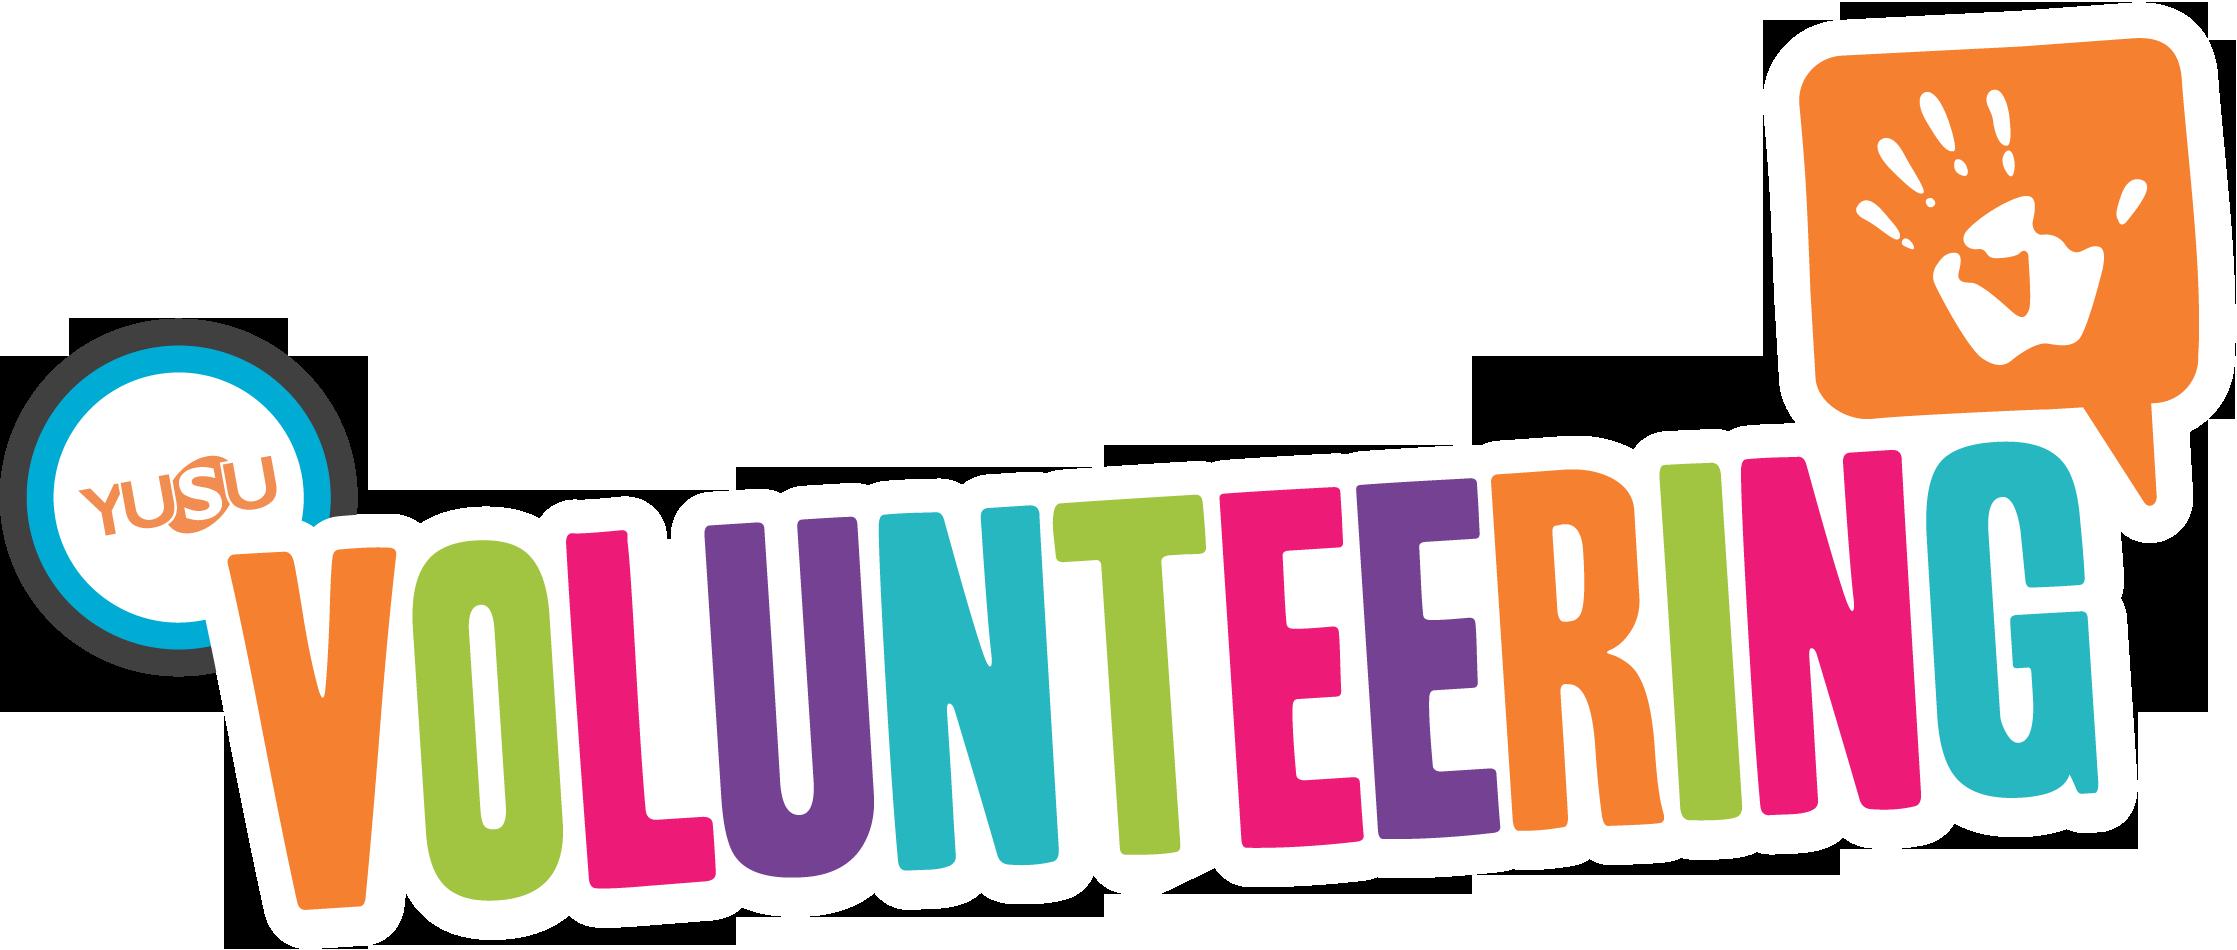 2237x950 Volunteering @ University Of York Students' Union